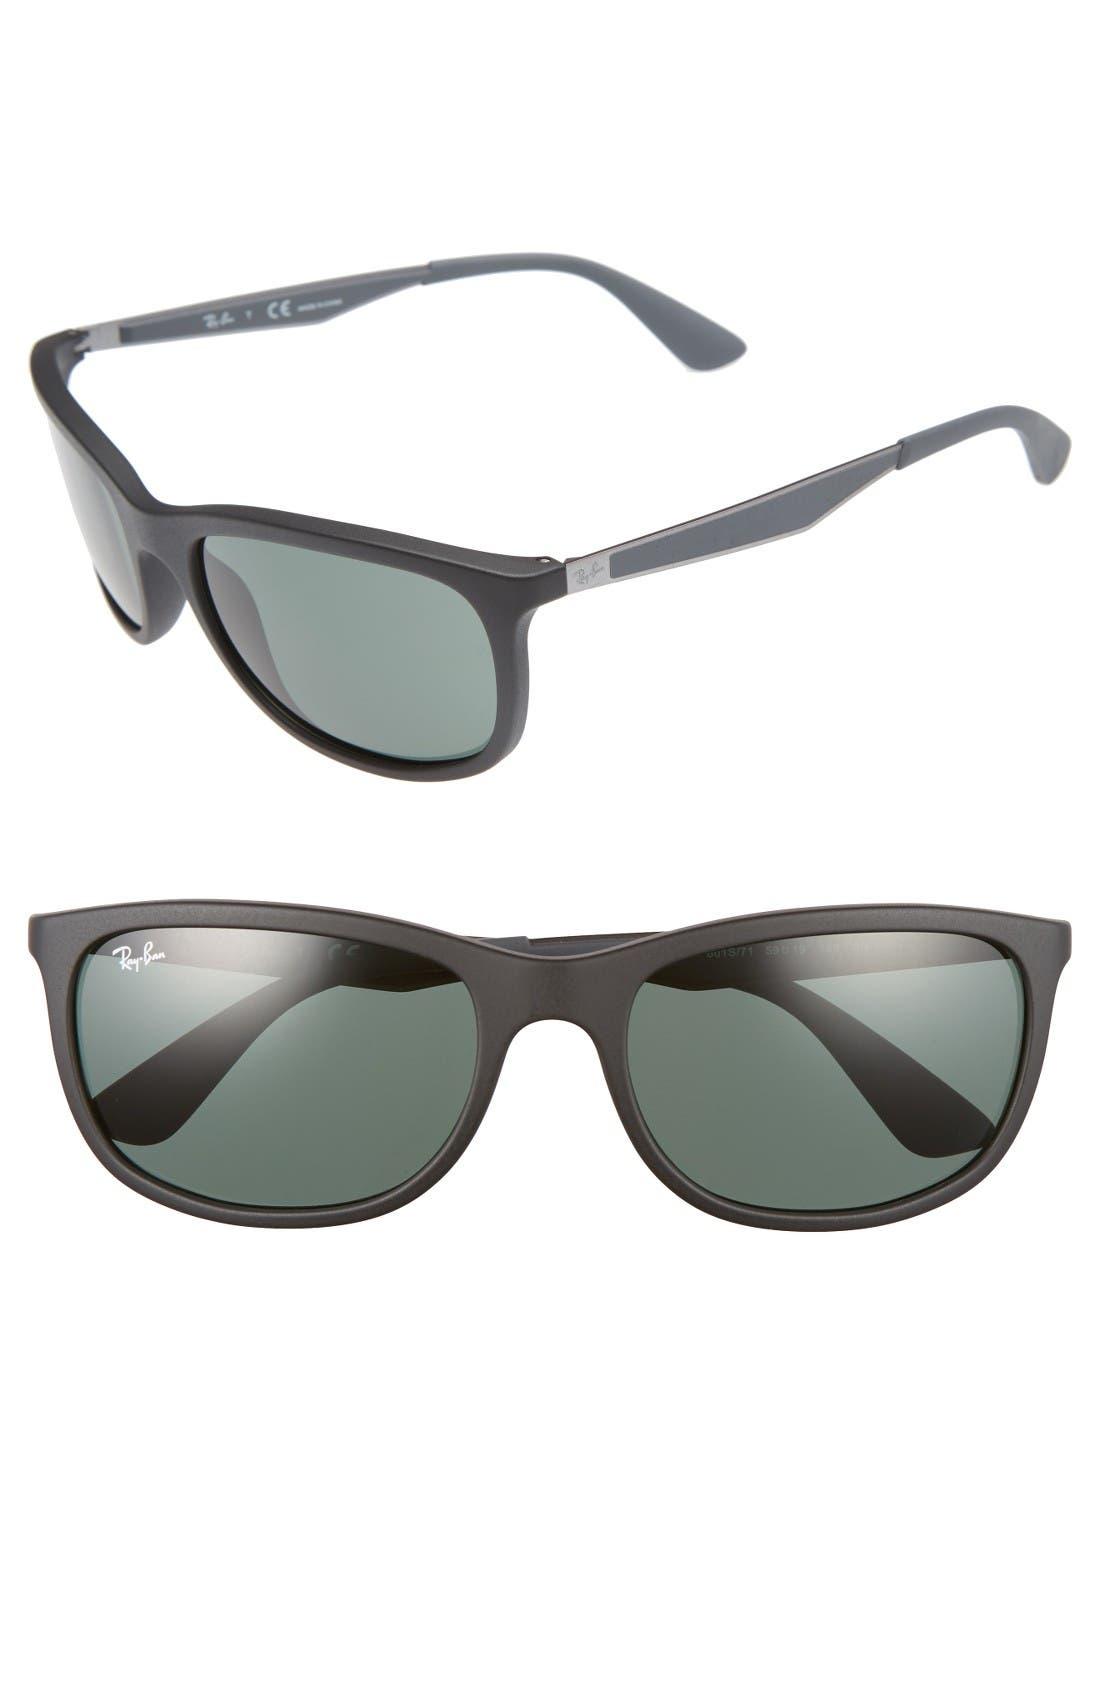 Main Image - Ray-Ban Wayfarer 59mm Sunglasses